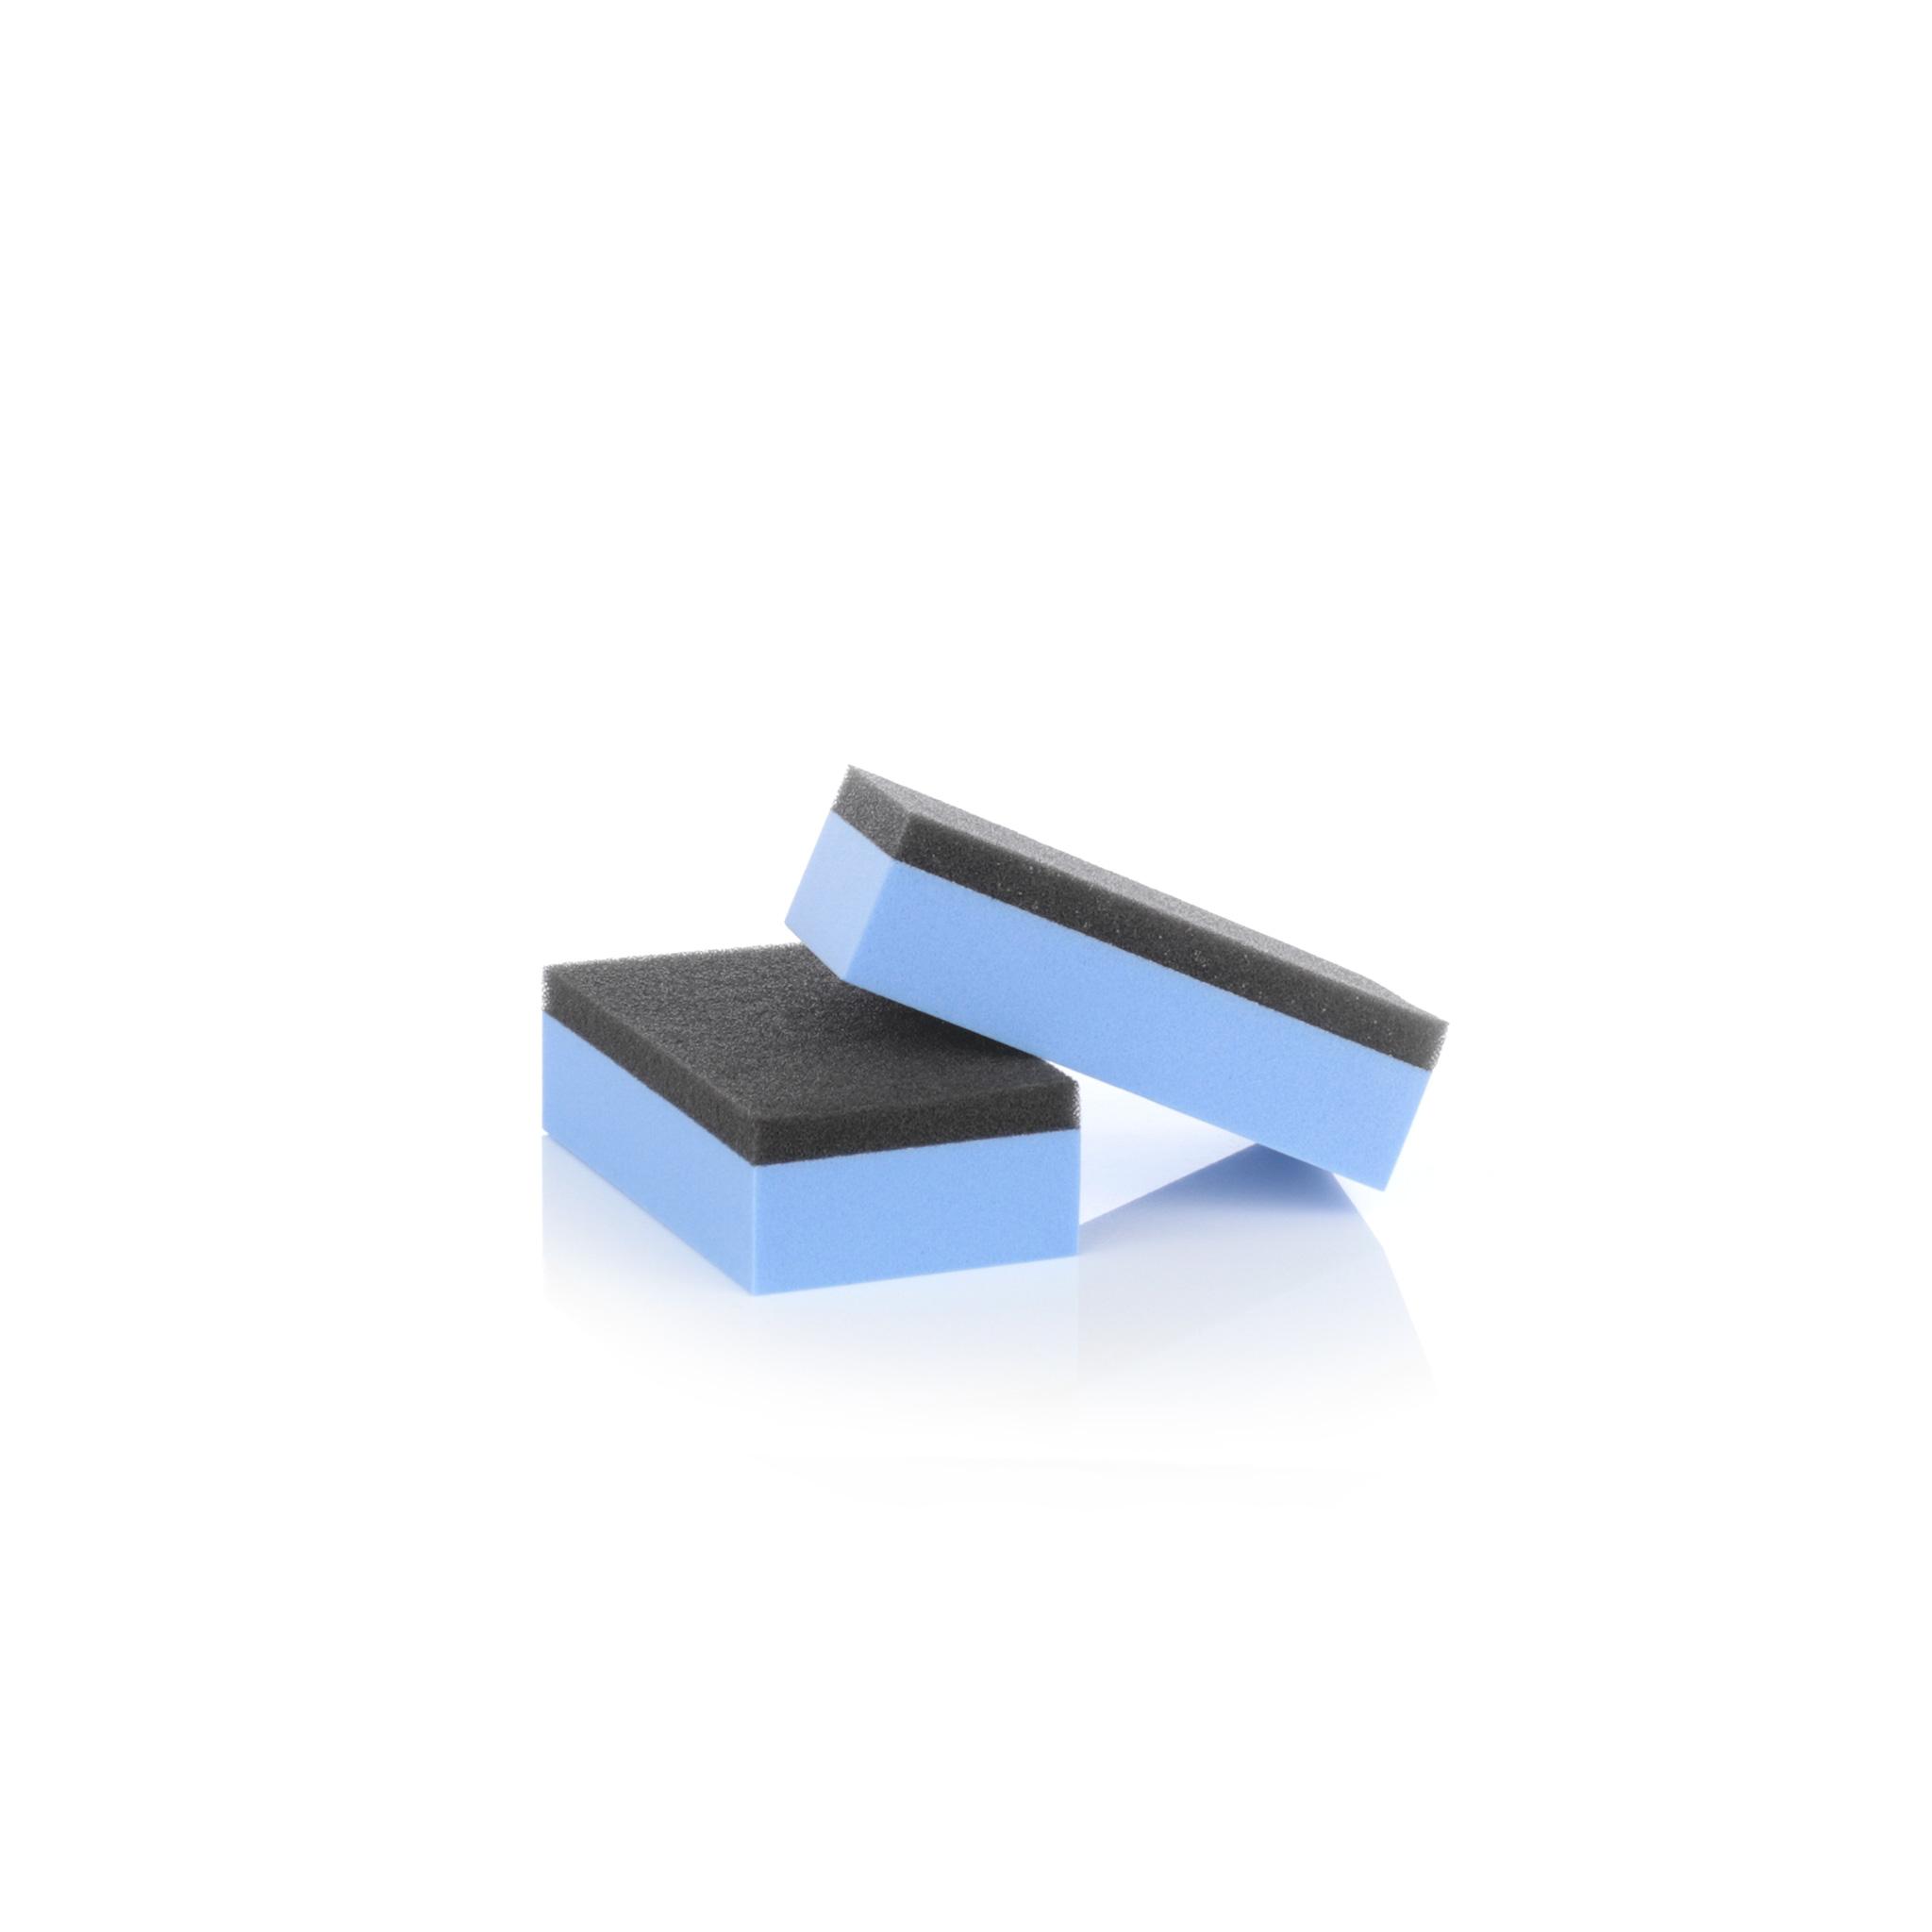 Appliceringssvamp SX ProMax, 12 st, 7 x 4 cm